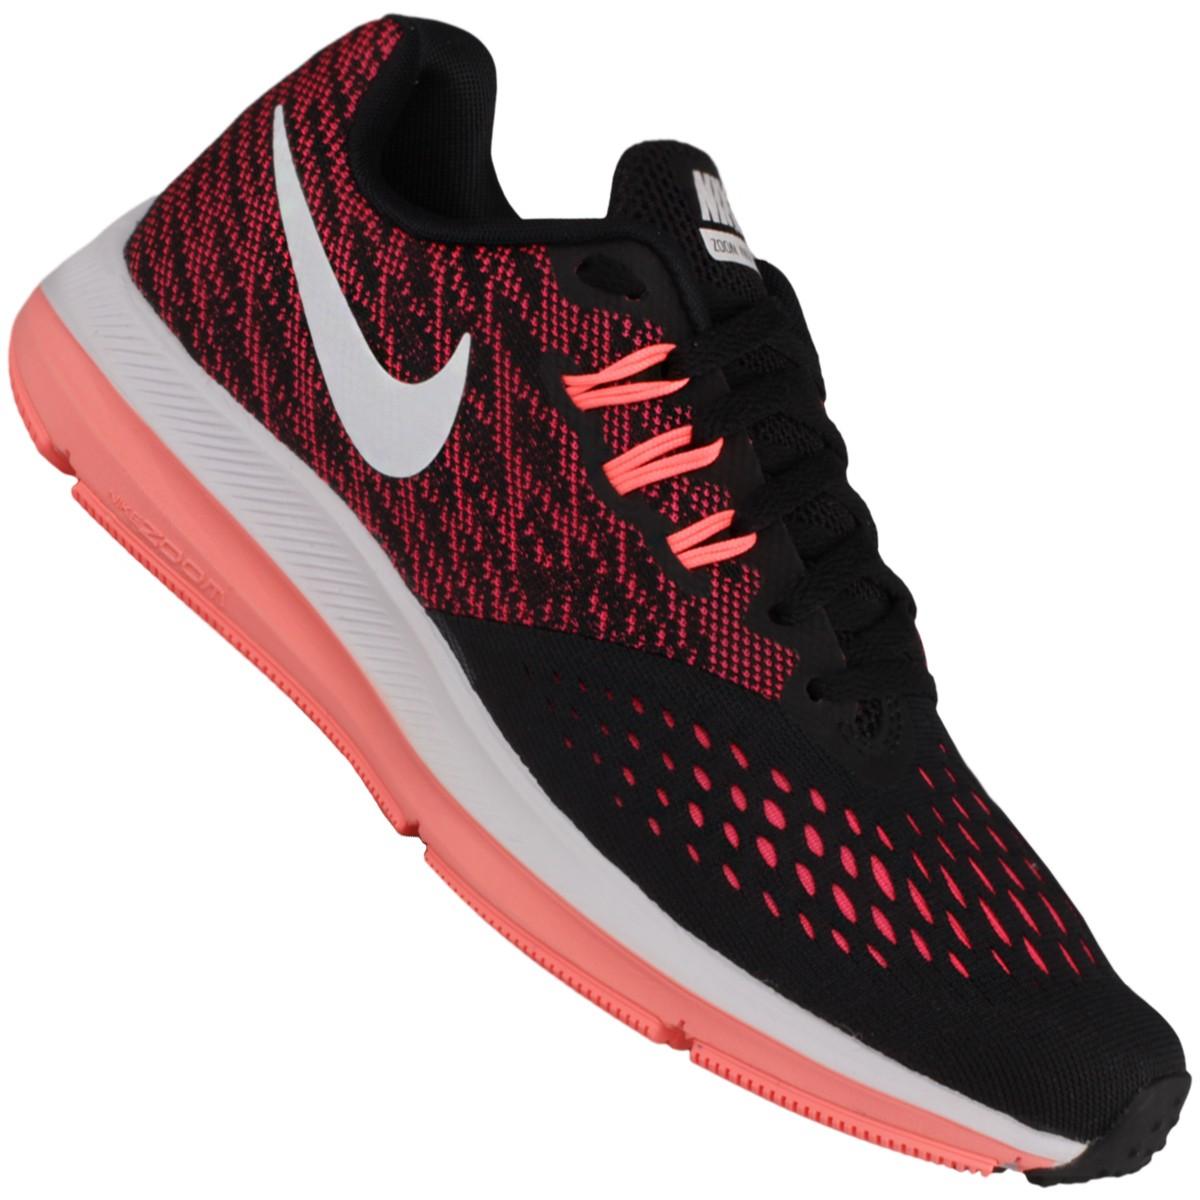 e00c4443fb7 Tênis Nike Wmns Zoom Winflo 4